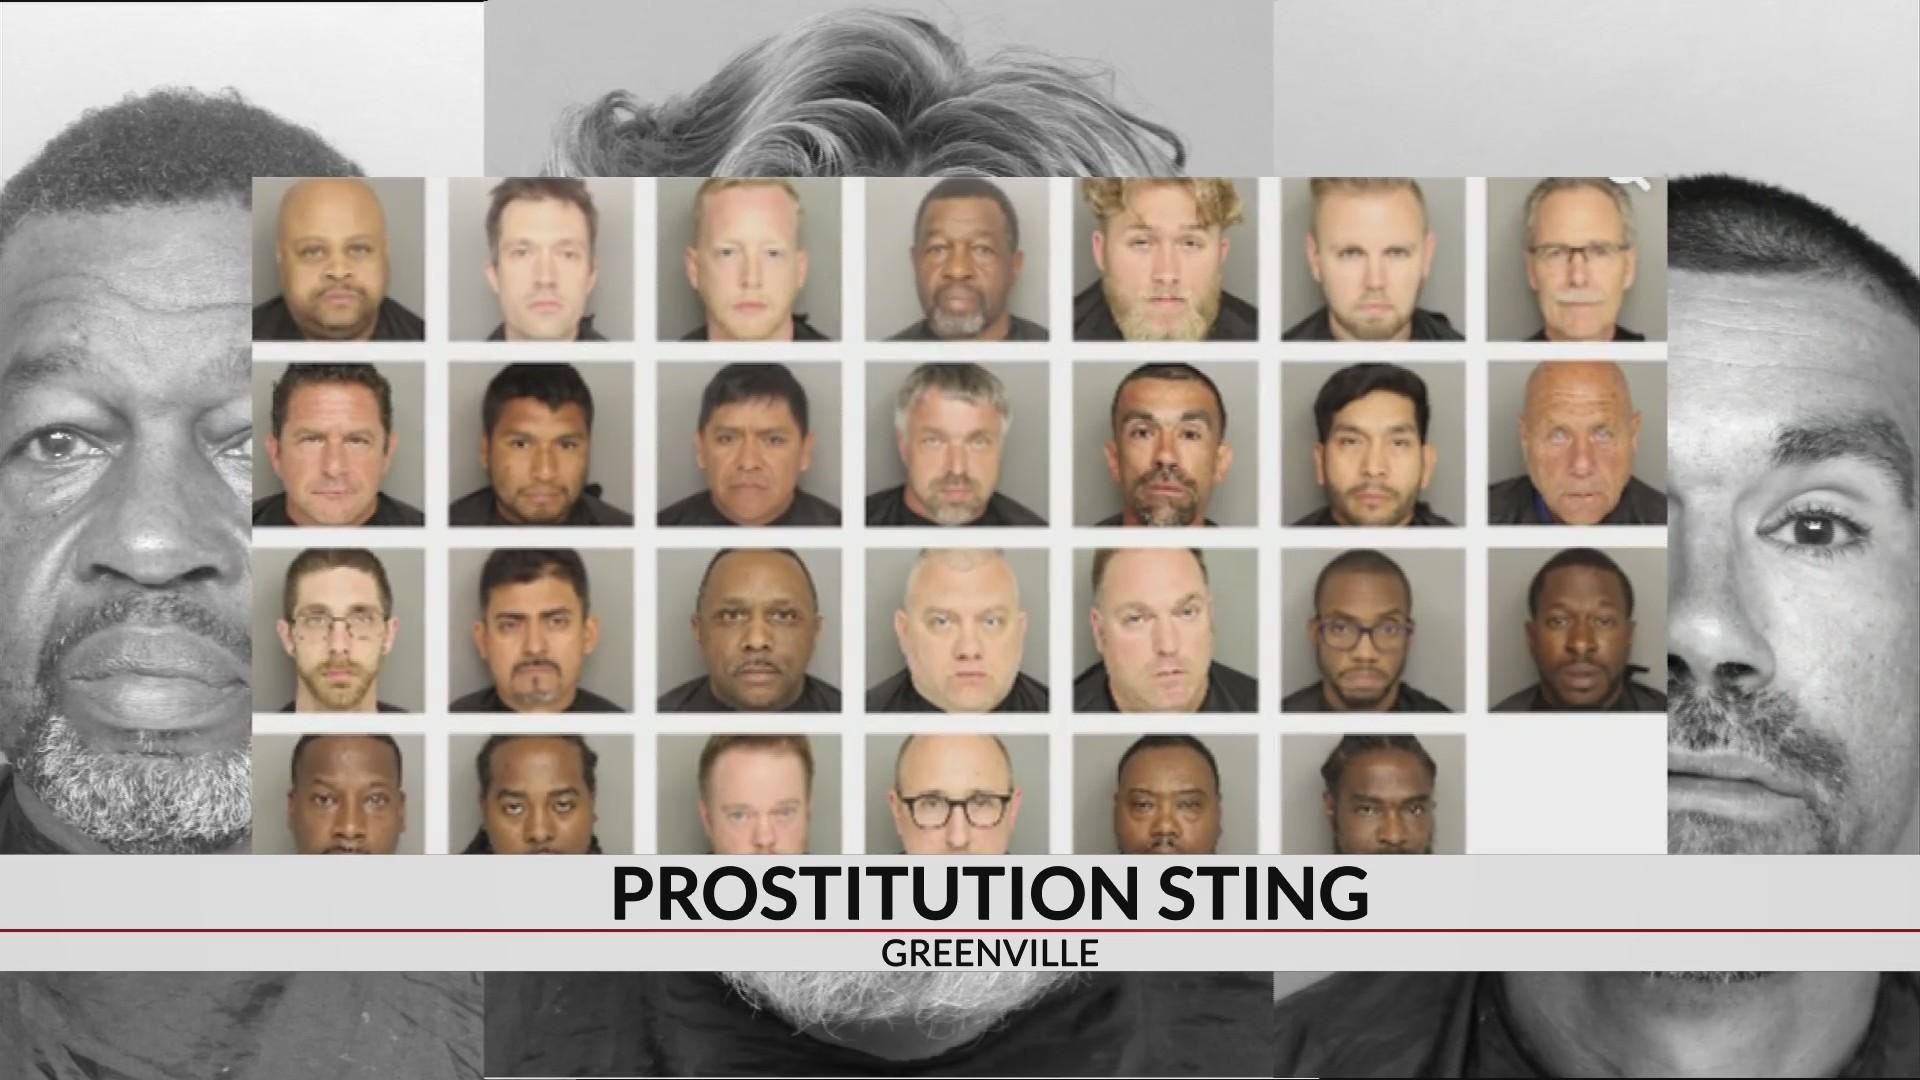 Sex sting in hendersonville north carolina